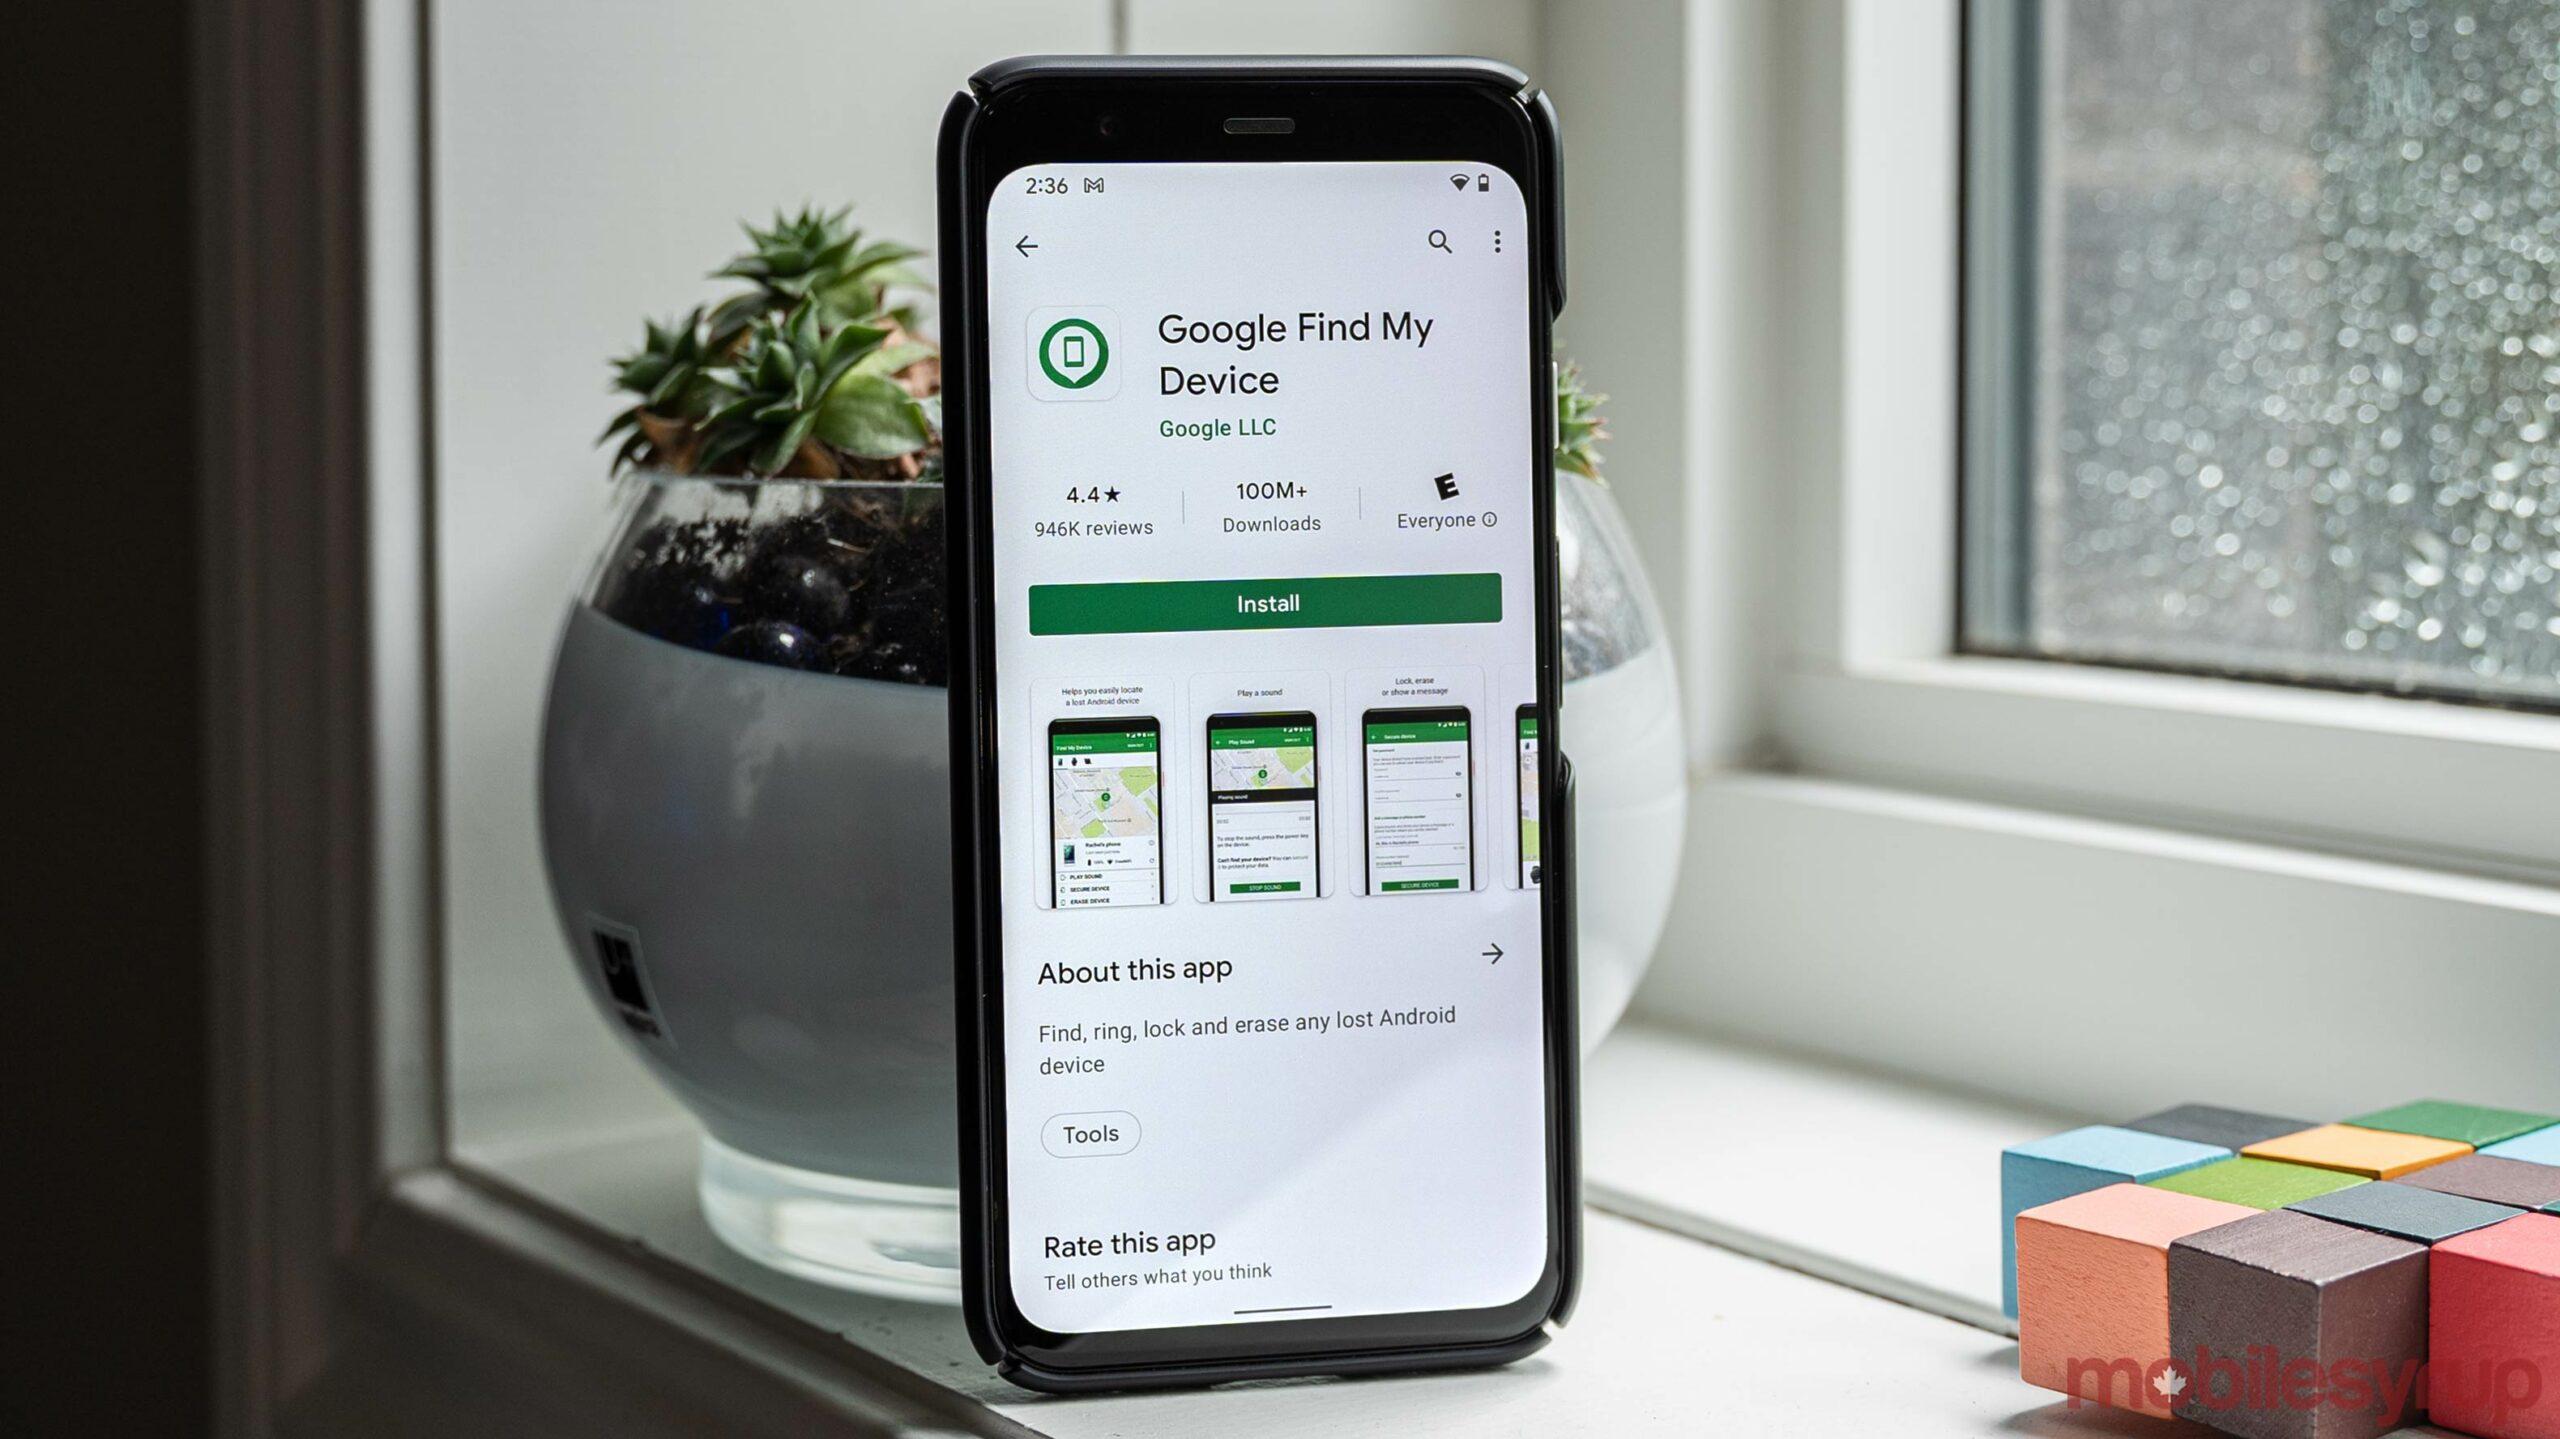 Google Find My Device app on Pixel 4